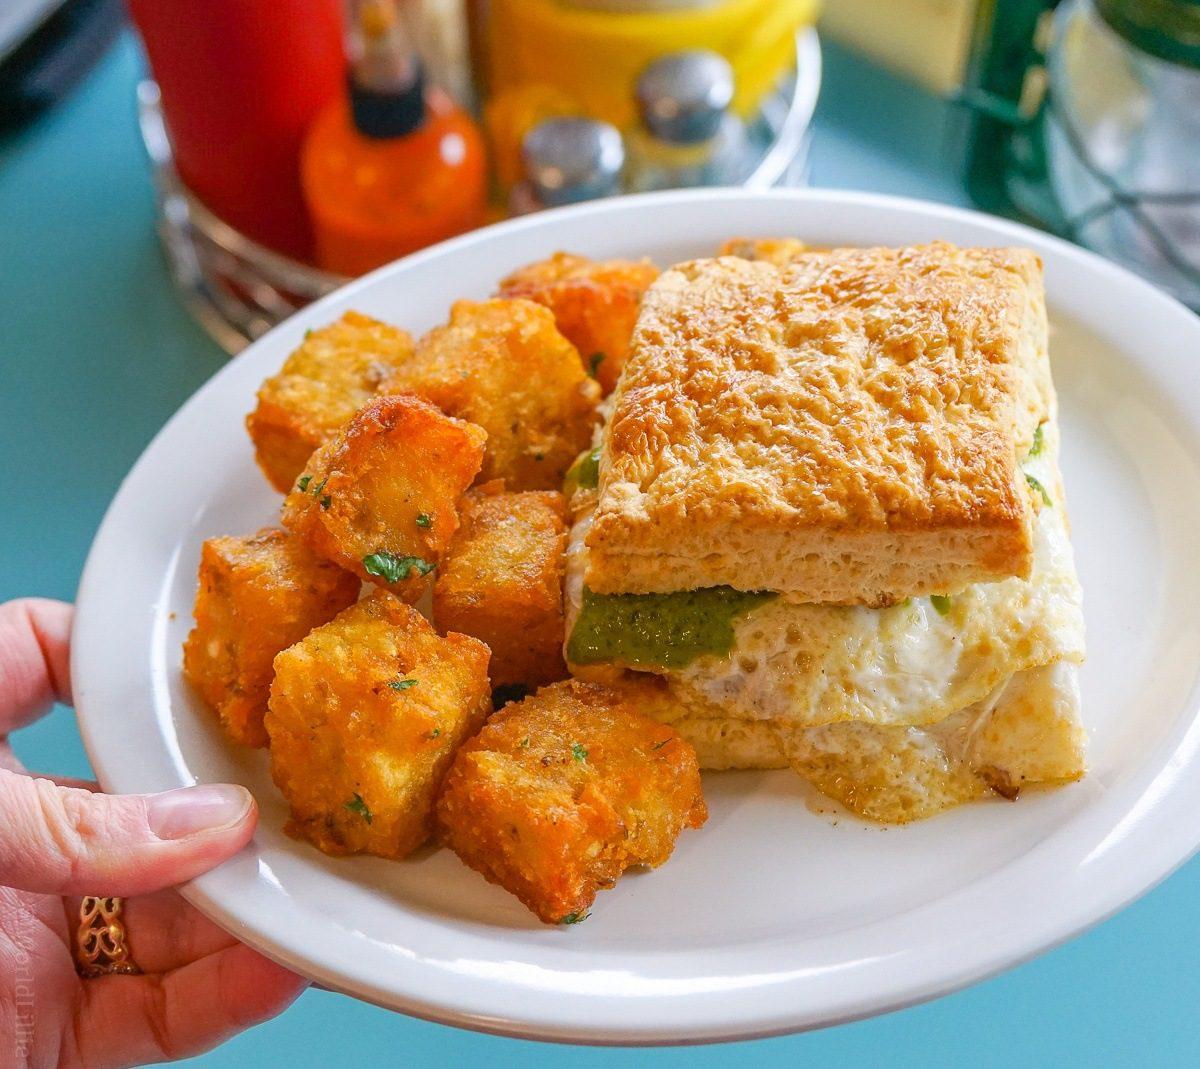 Portland Maine restaurants: Dutch's hash browns